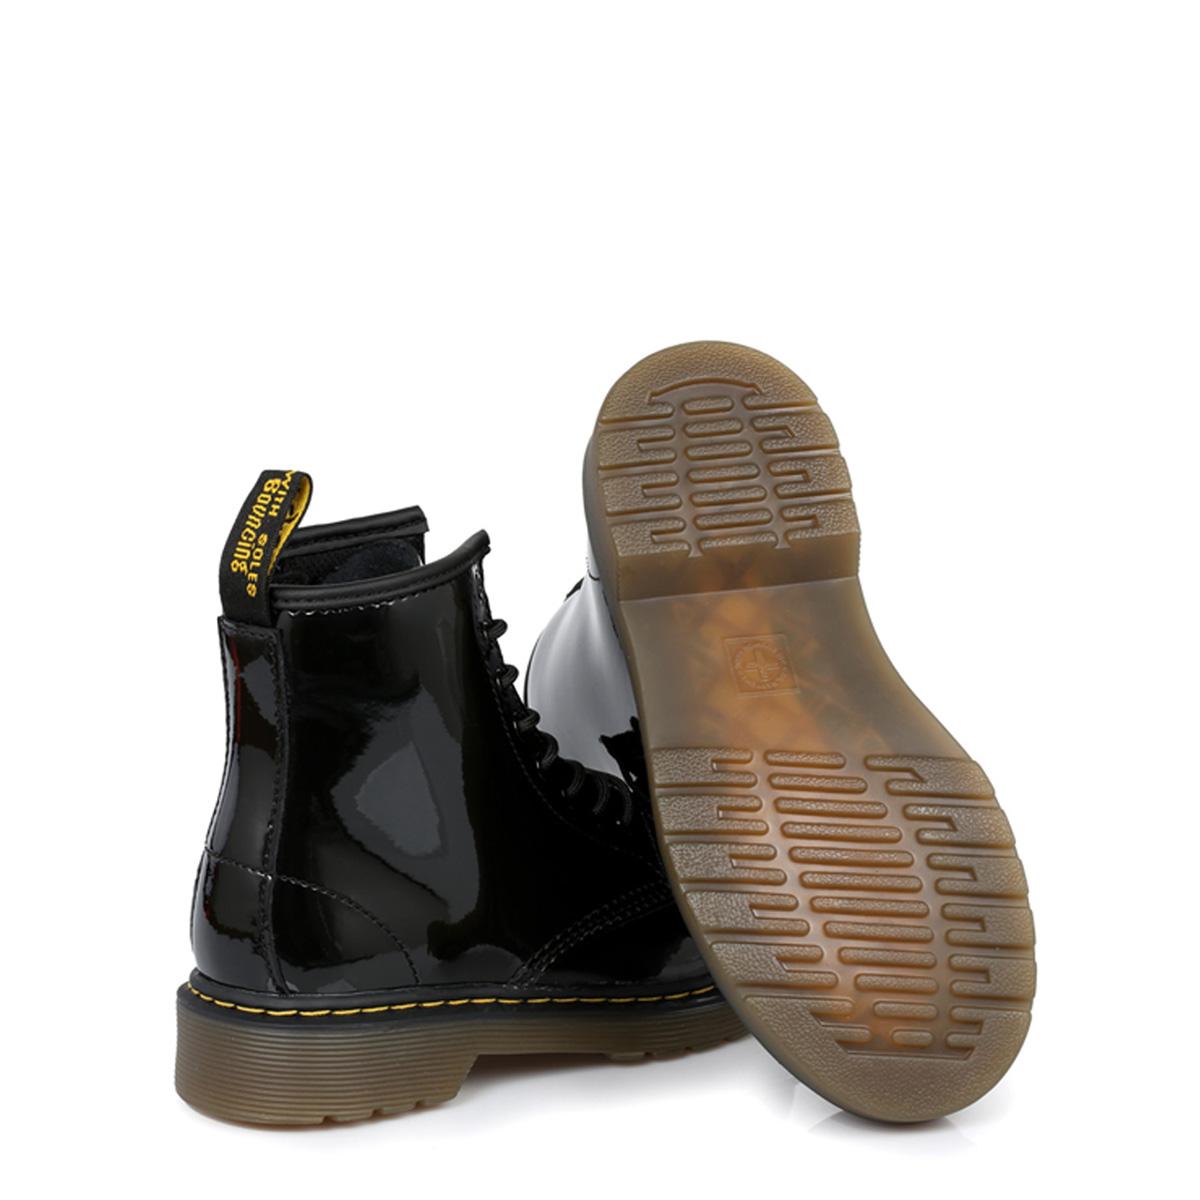 0b05b5ef21a6 Dr. Martens Infants Girls Boys Kids Docs Boots Black Leather Lace Up Ankle  Shoes